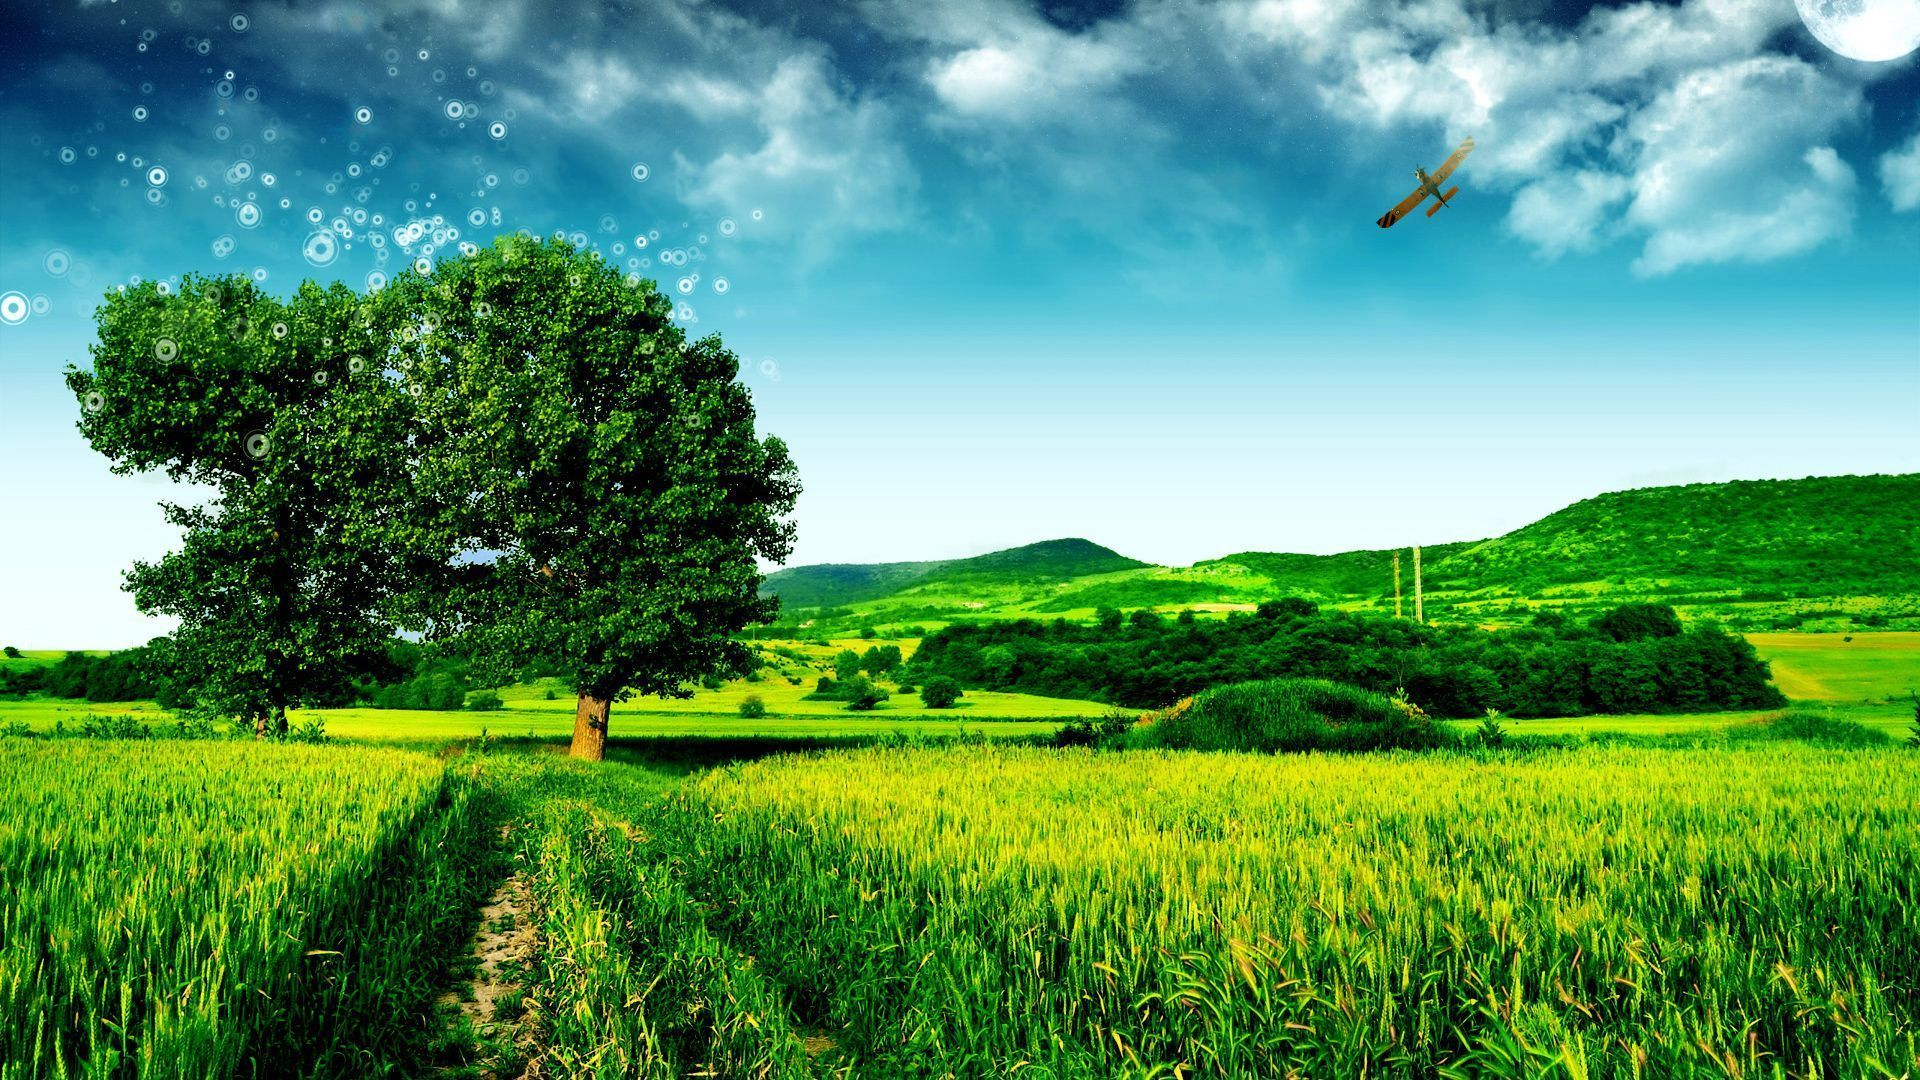 Beautiful Green Landscape Wallpaper Desktop 1920x1080